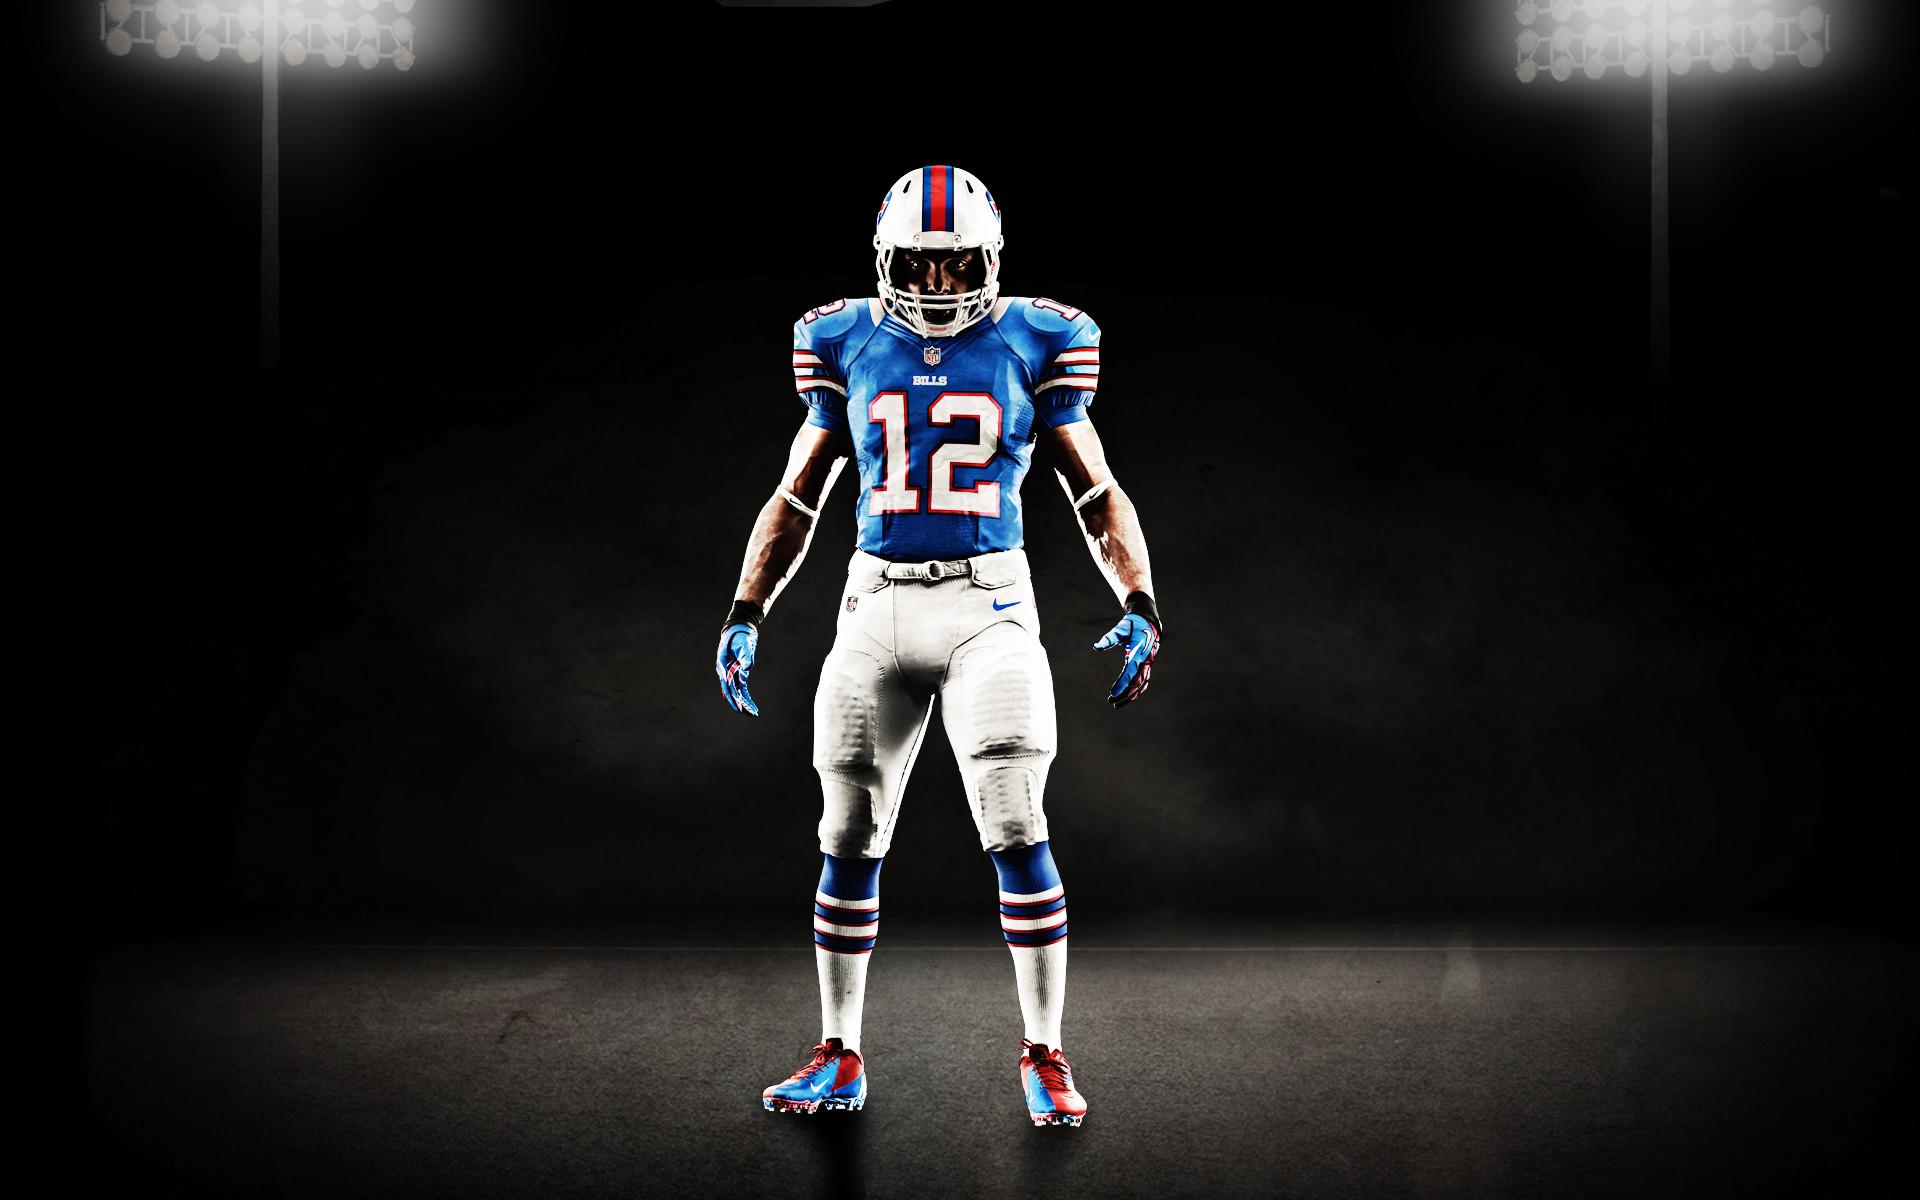 Nike American Football Wallpaper 51 Images